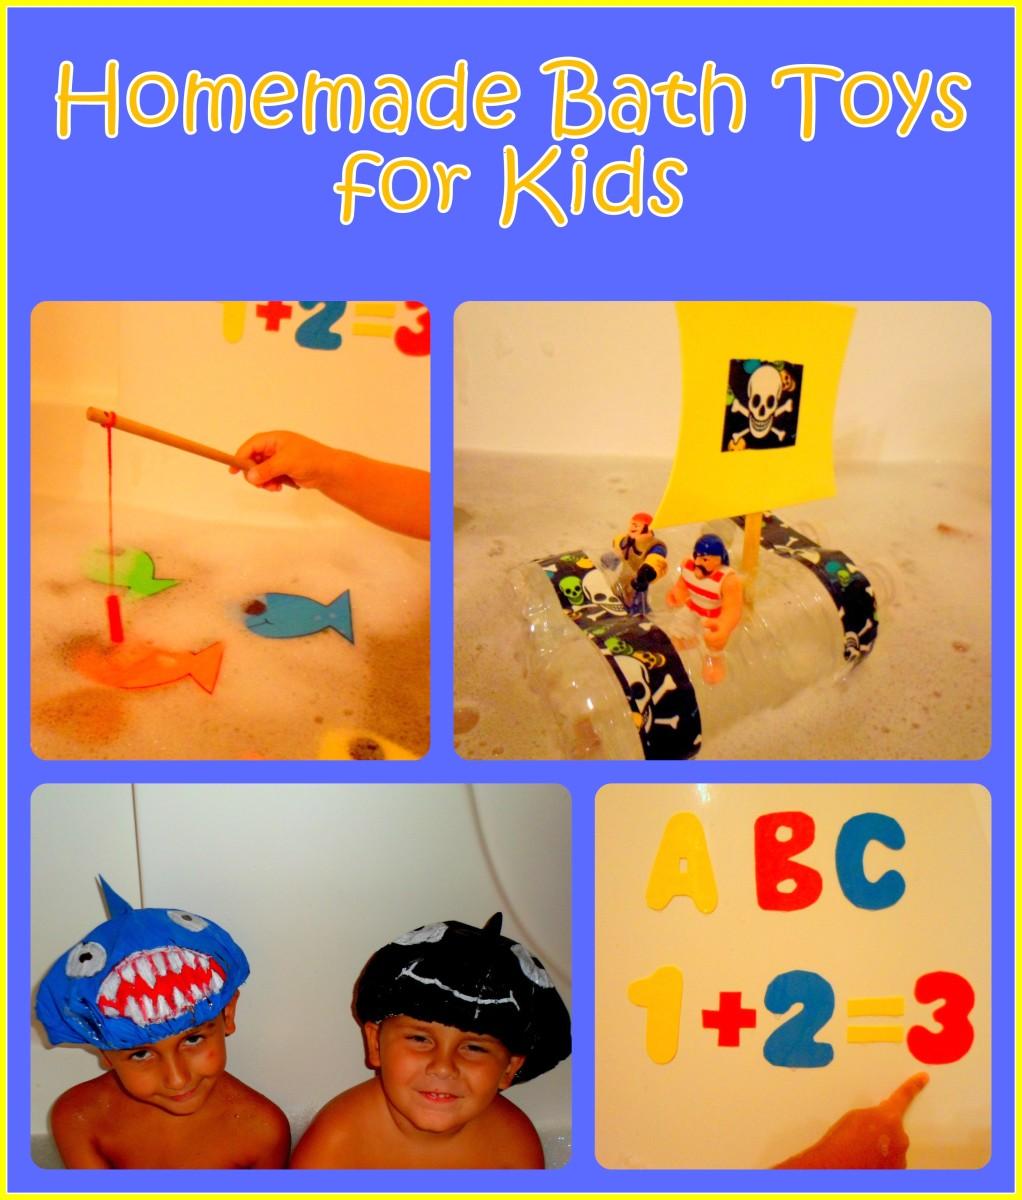 how to make homemade bath toys for kids wehavekids. Black Bedroom Furniture Sets. Home Design Ideas